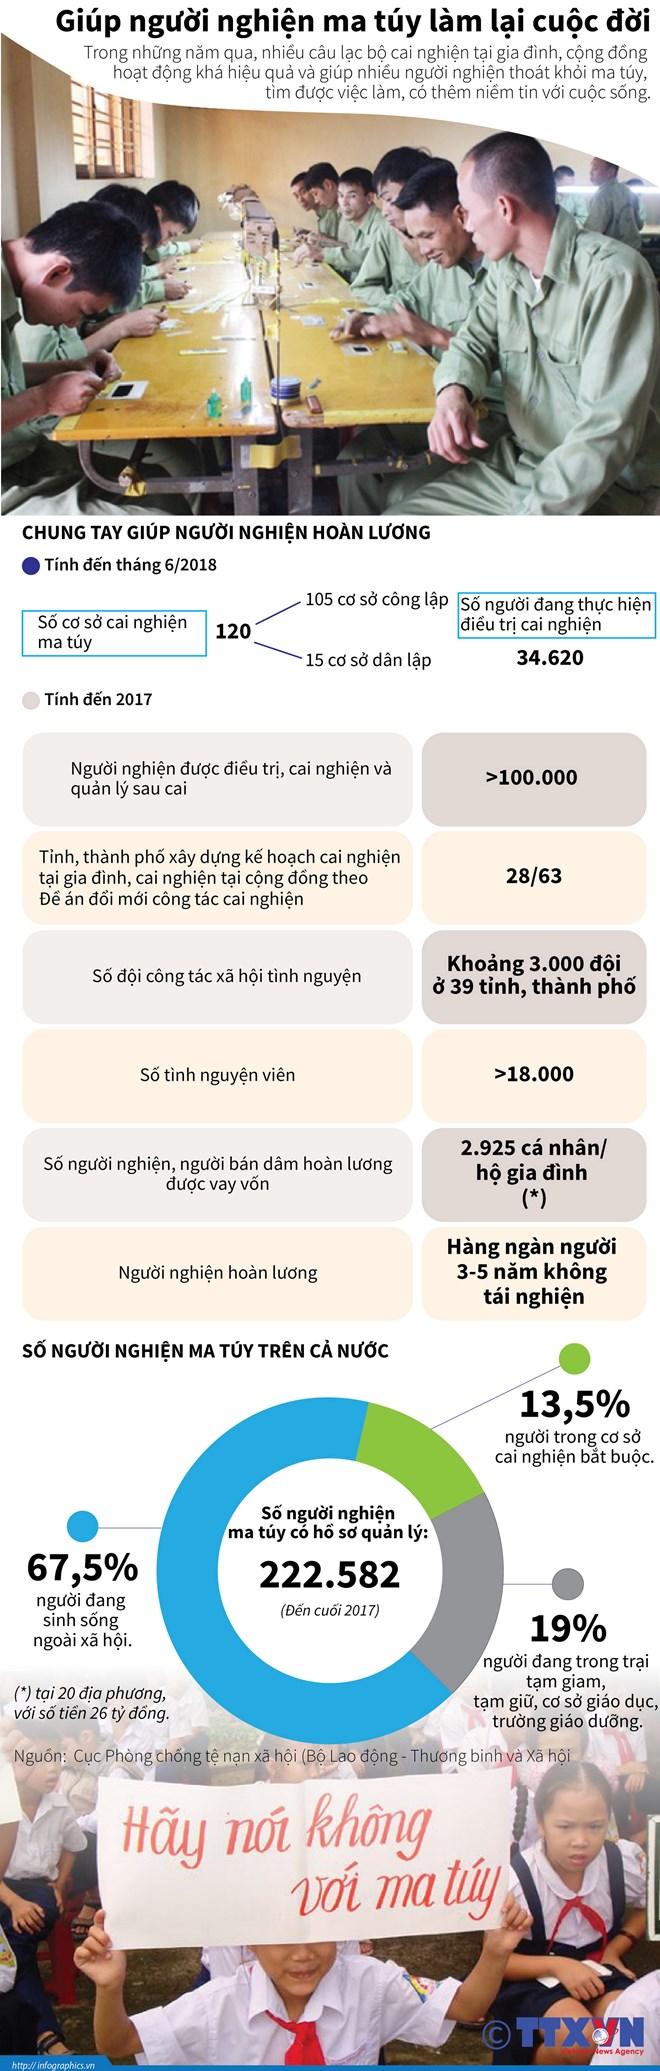 infographics thong ke dang lo ngai ve so nguoi nghien ma tuy